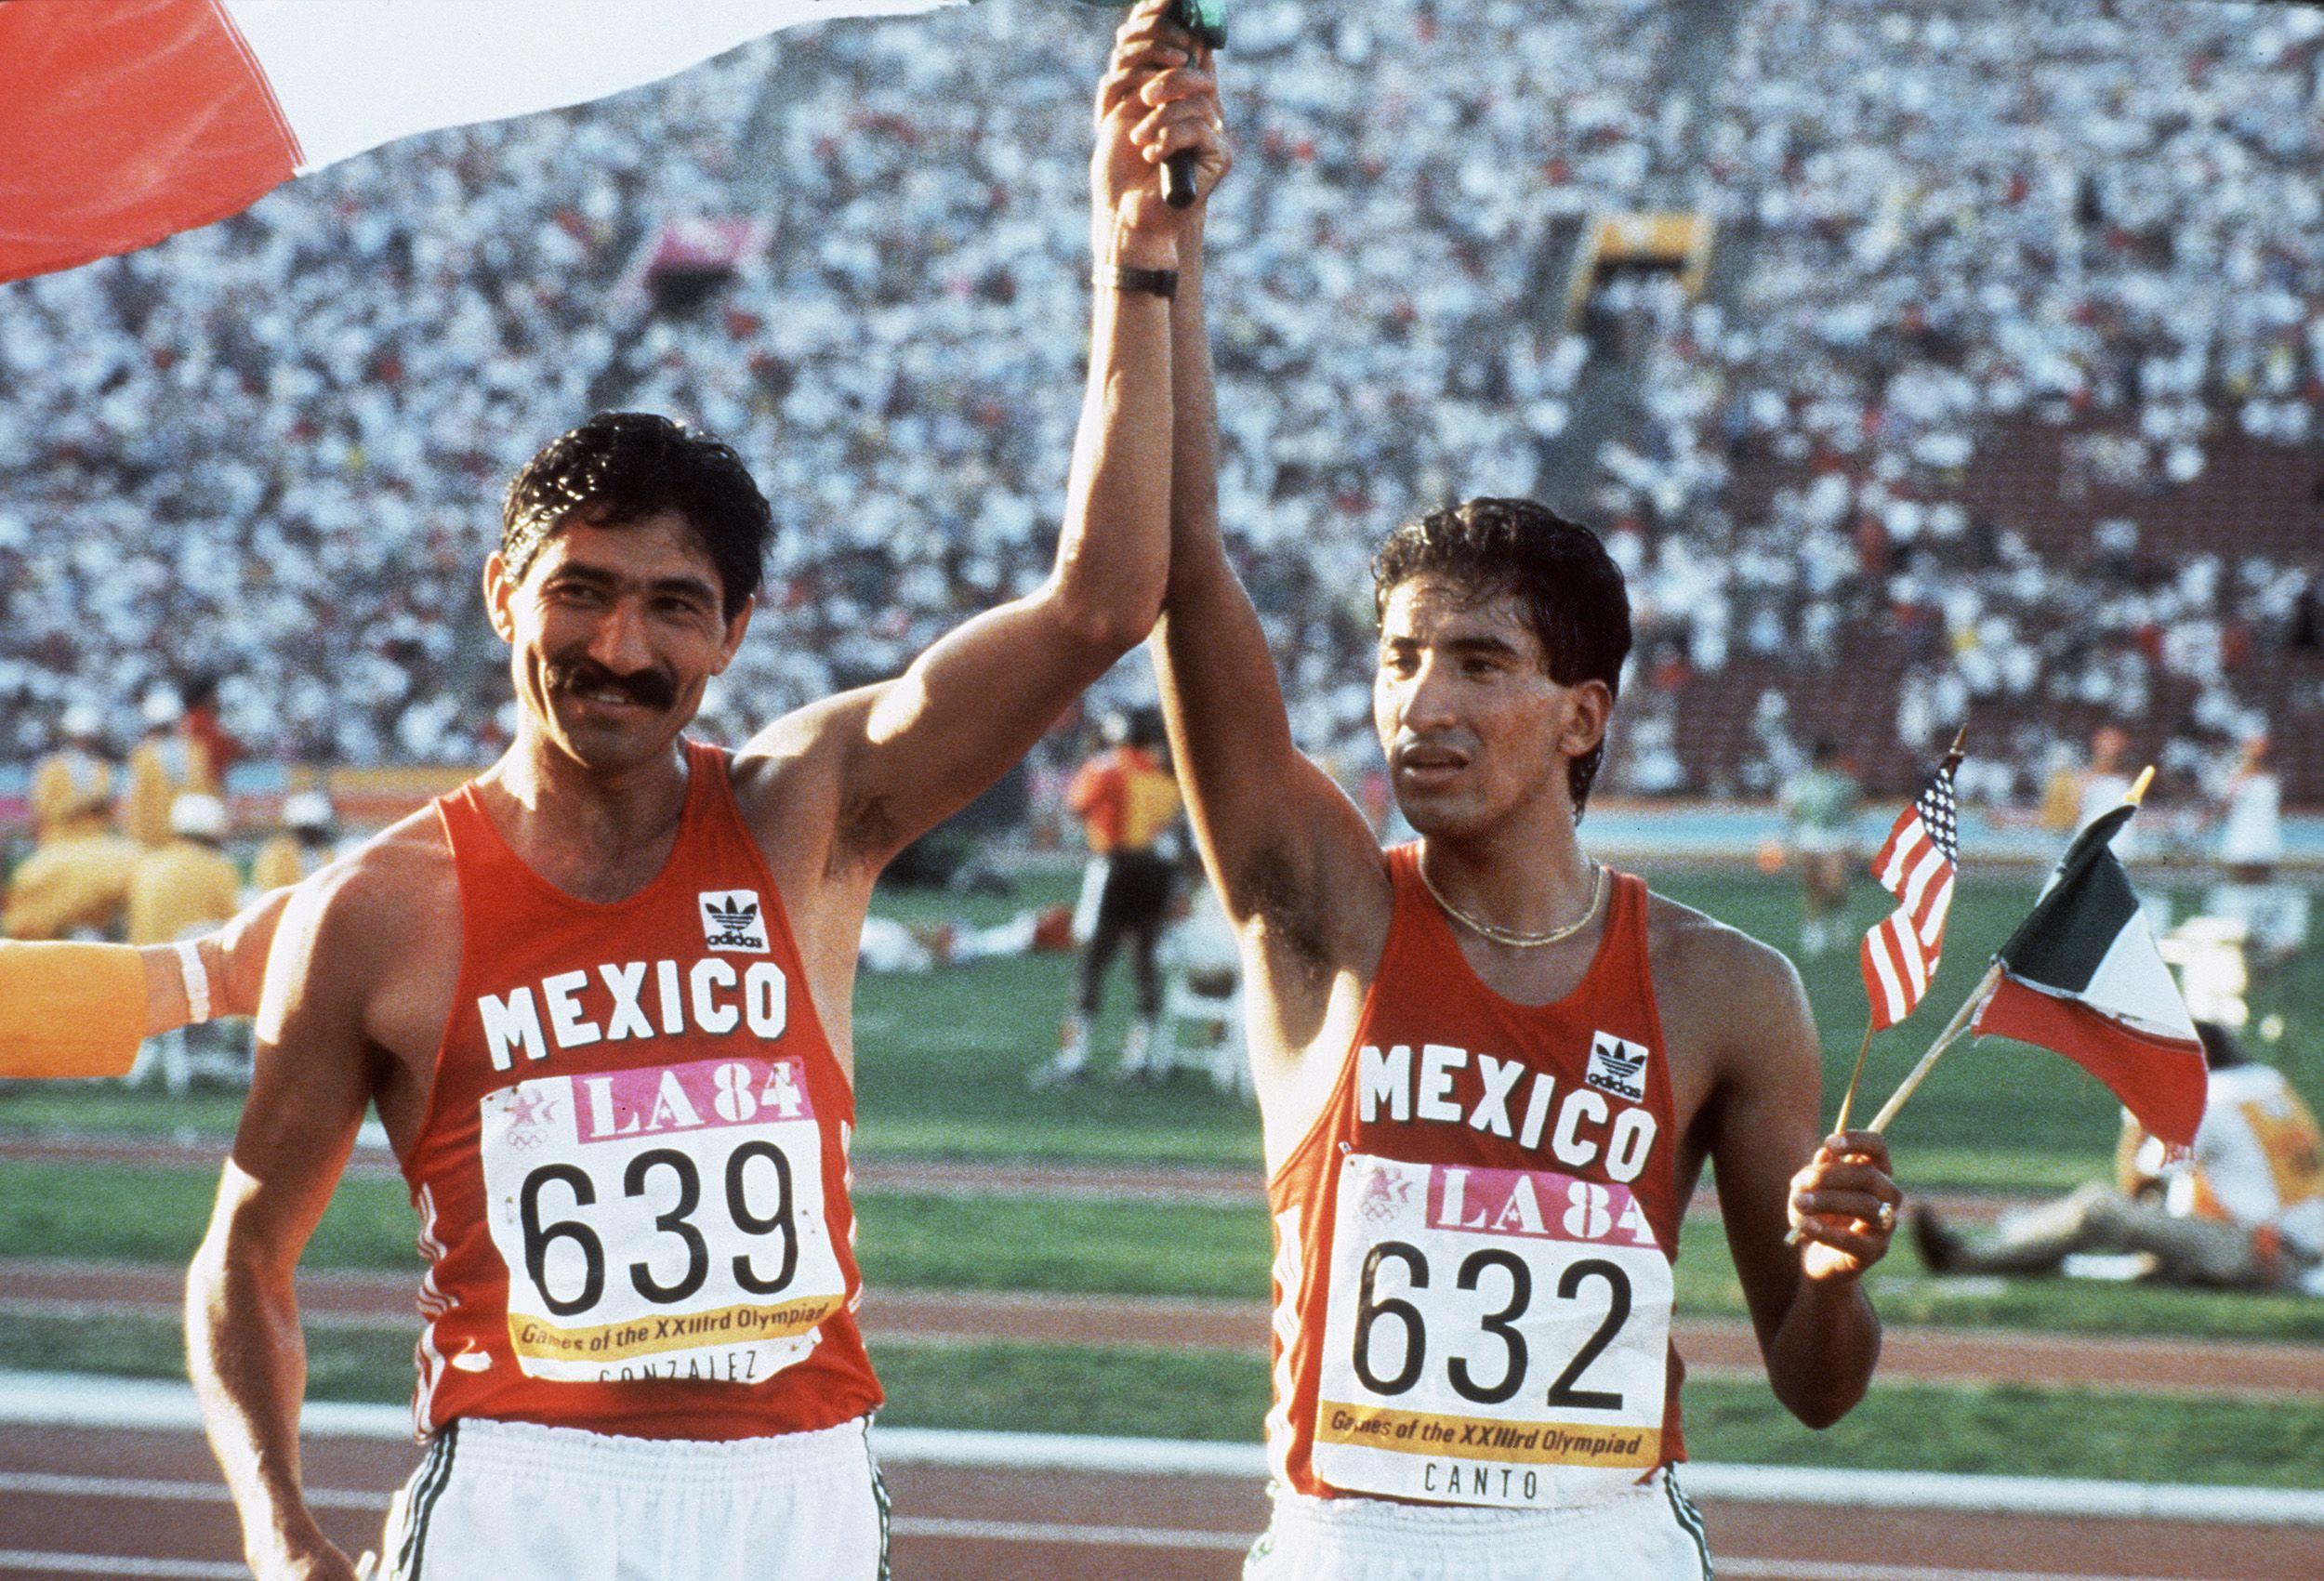 1984 Olympic 20km race walk champion Canto dies